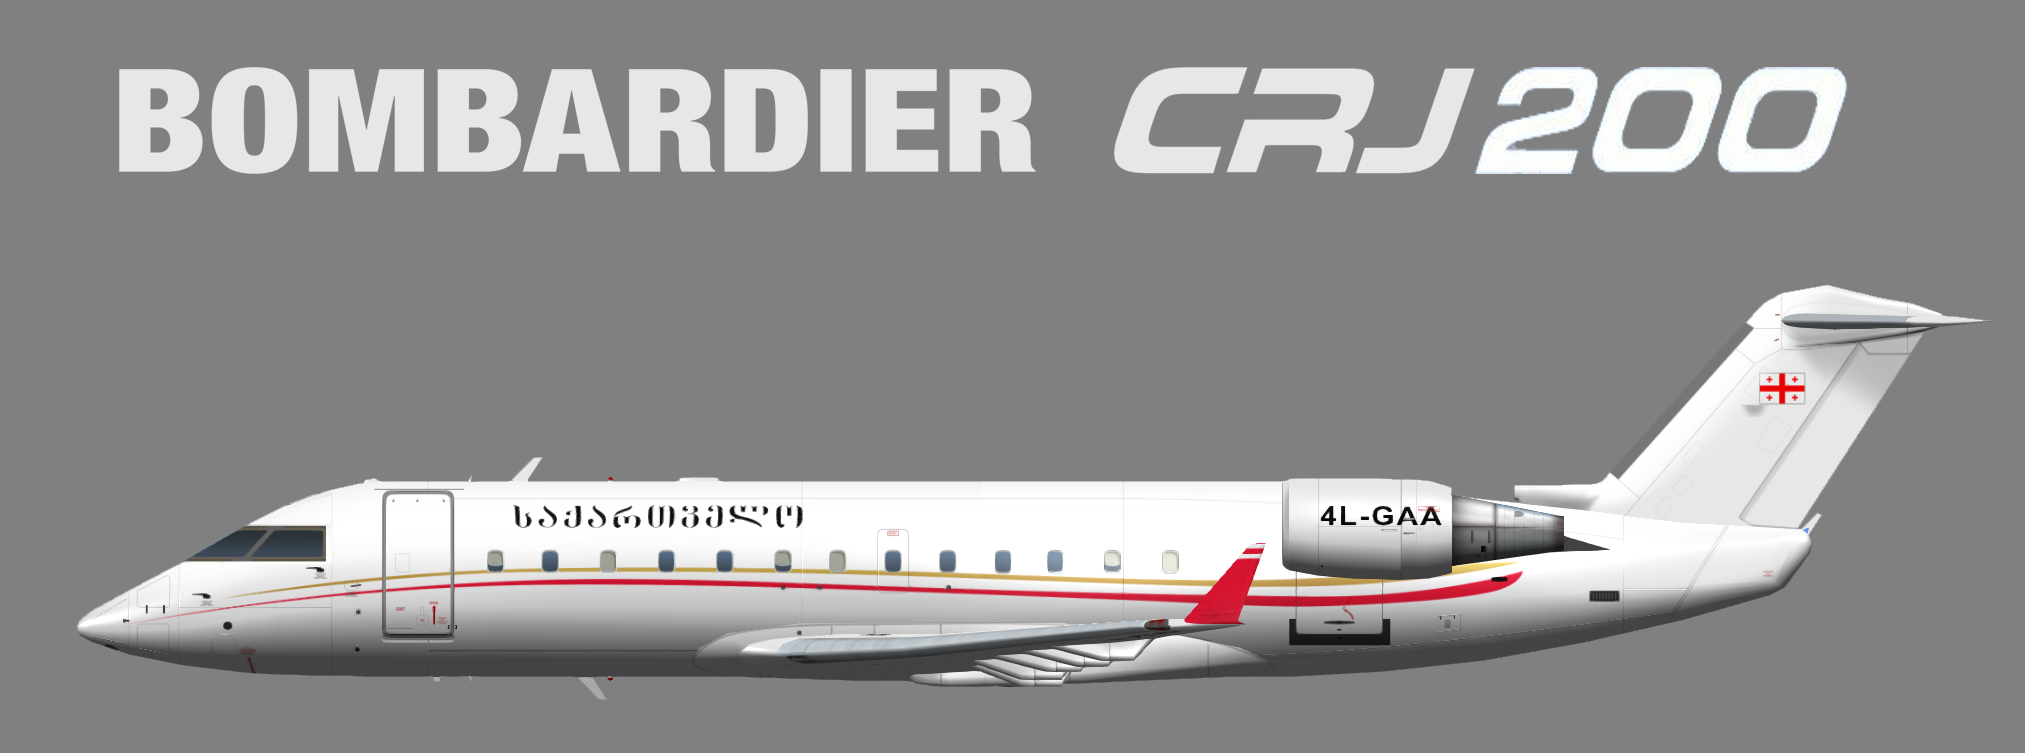 Georgian Government Bombardier CRJ200 (opb Georgian Airways)